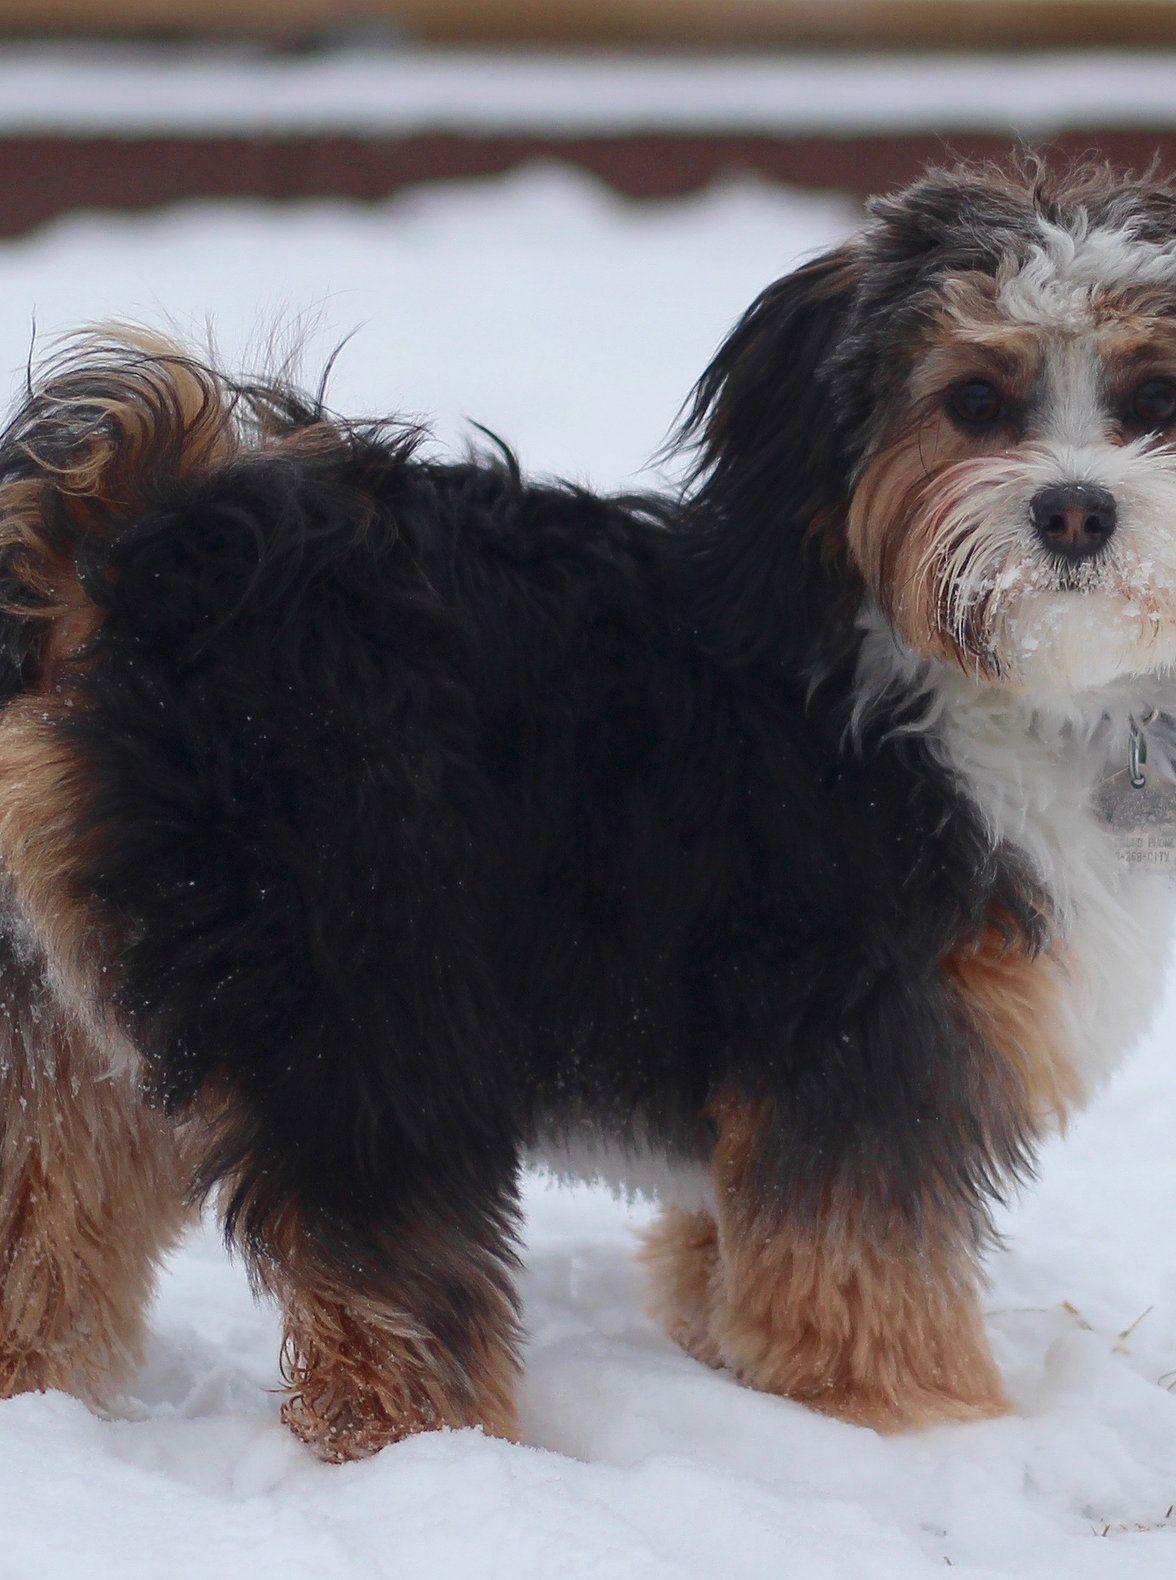 Bichon Shih Tzu Shichon Zuchon Puppies For Sale Breeder Of Quality Family Dogs Calgary Alberta Canada Zuchon Puppies For Sale Shih Tzu Shih Tzu Puppy